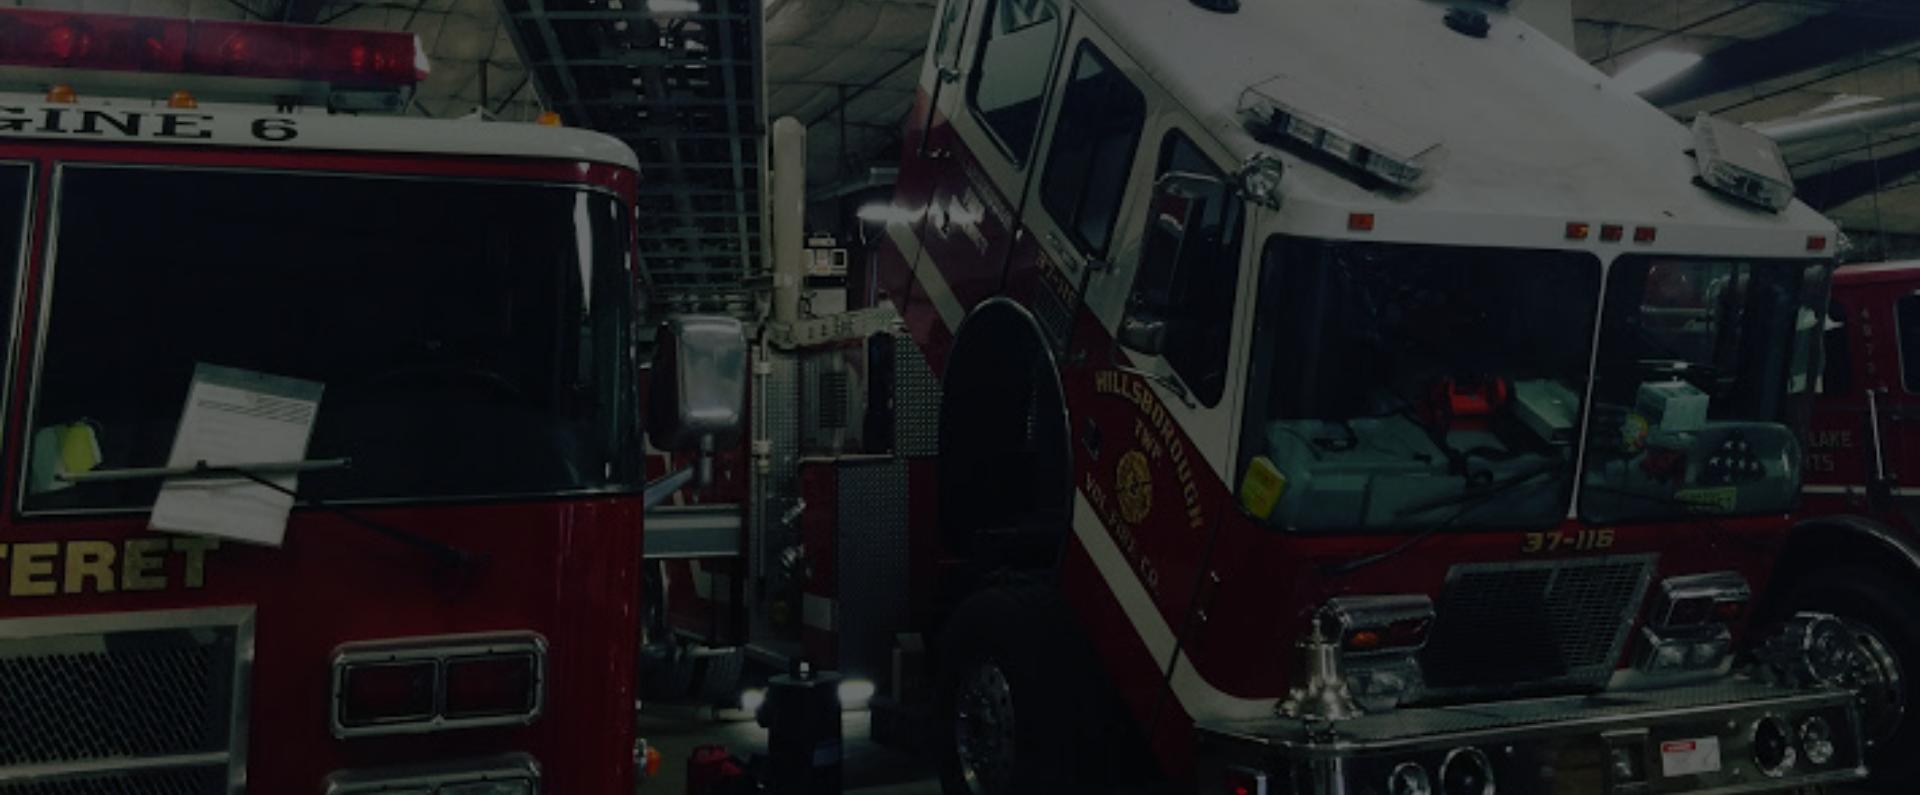 First Priority Emergency Vehicles Fire Mechanic Career Job Opening Needed Firetruck